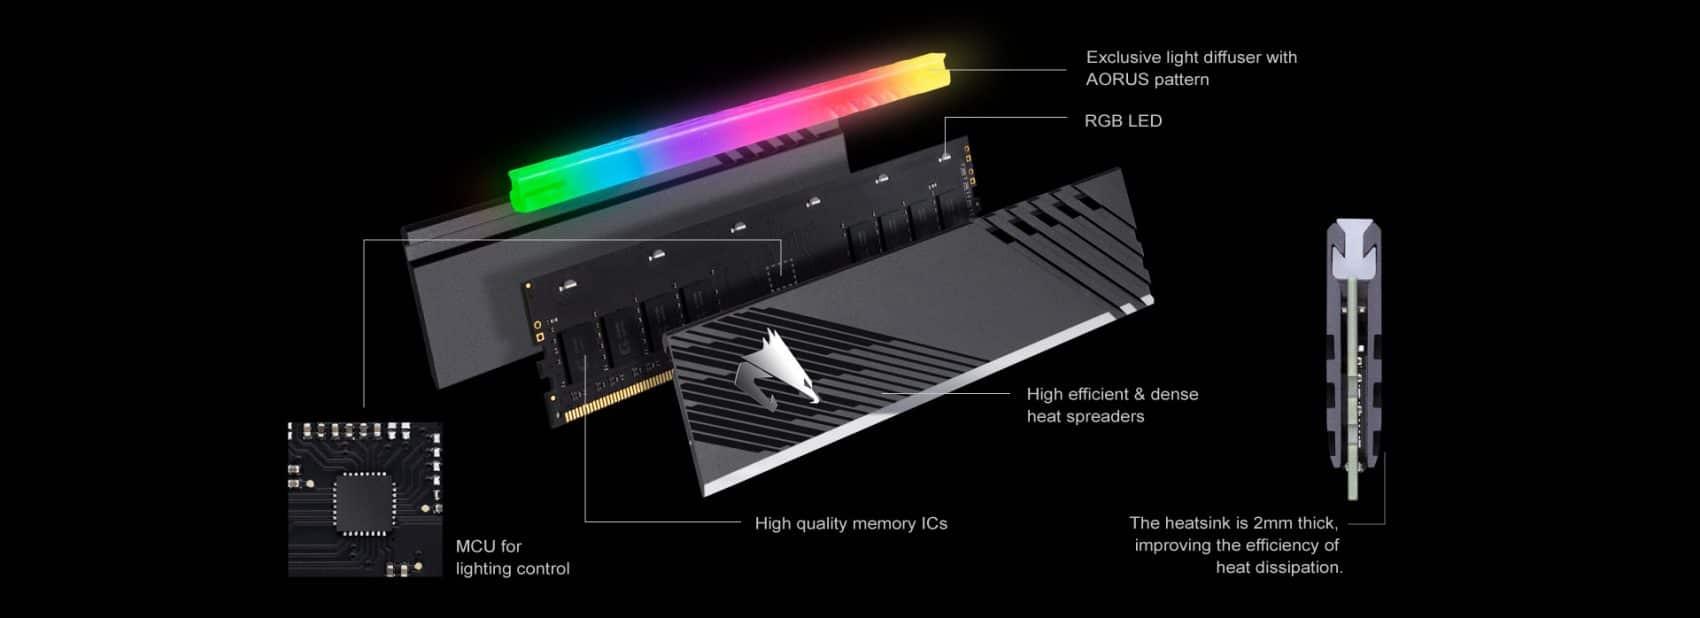 Description Gigabyte AORUS rgb memory DDR4-3600 MHz